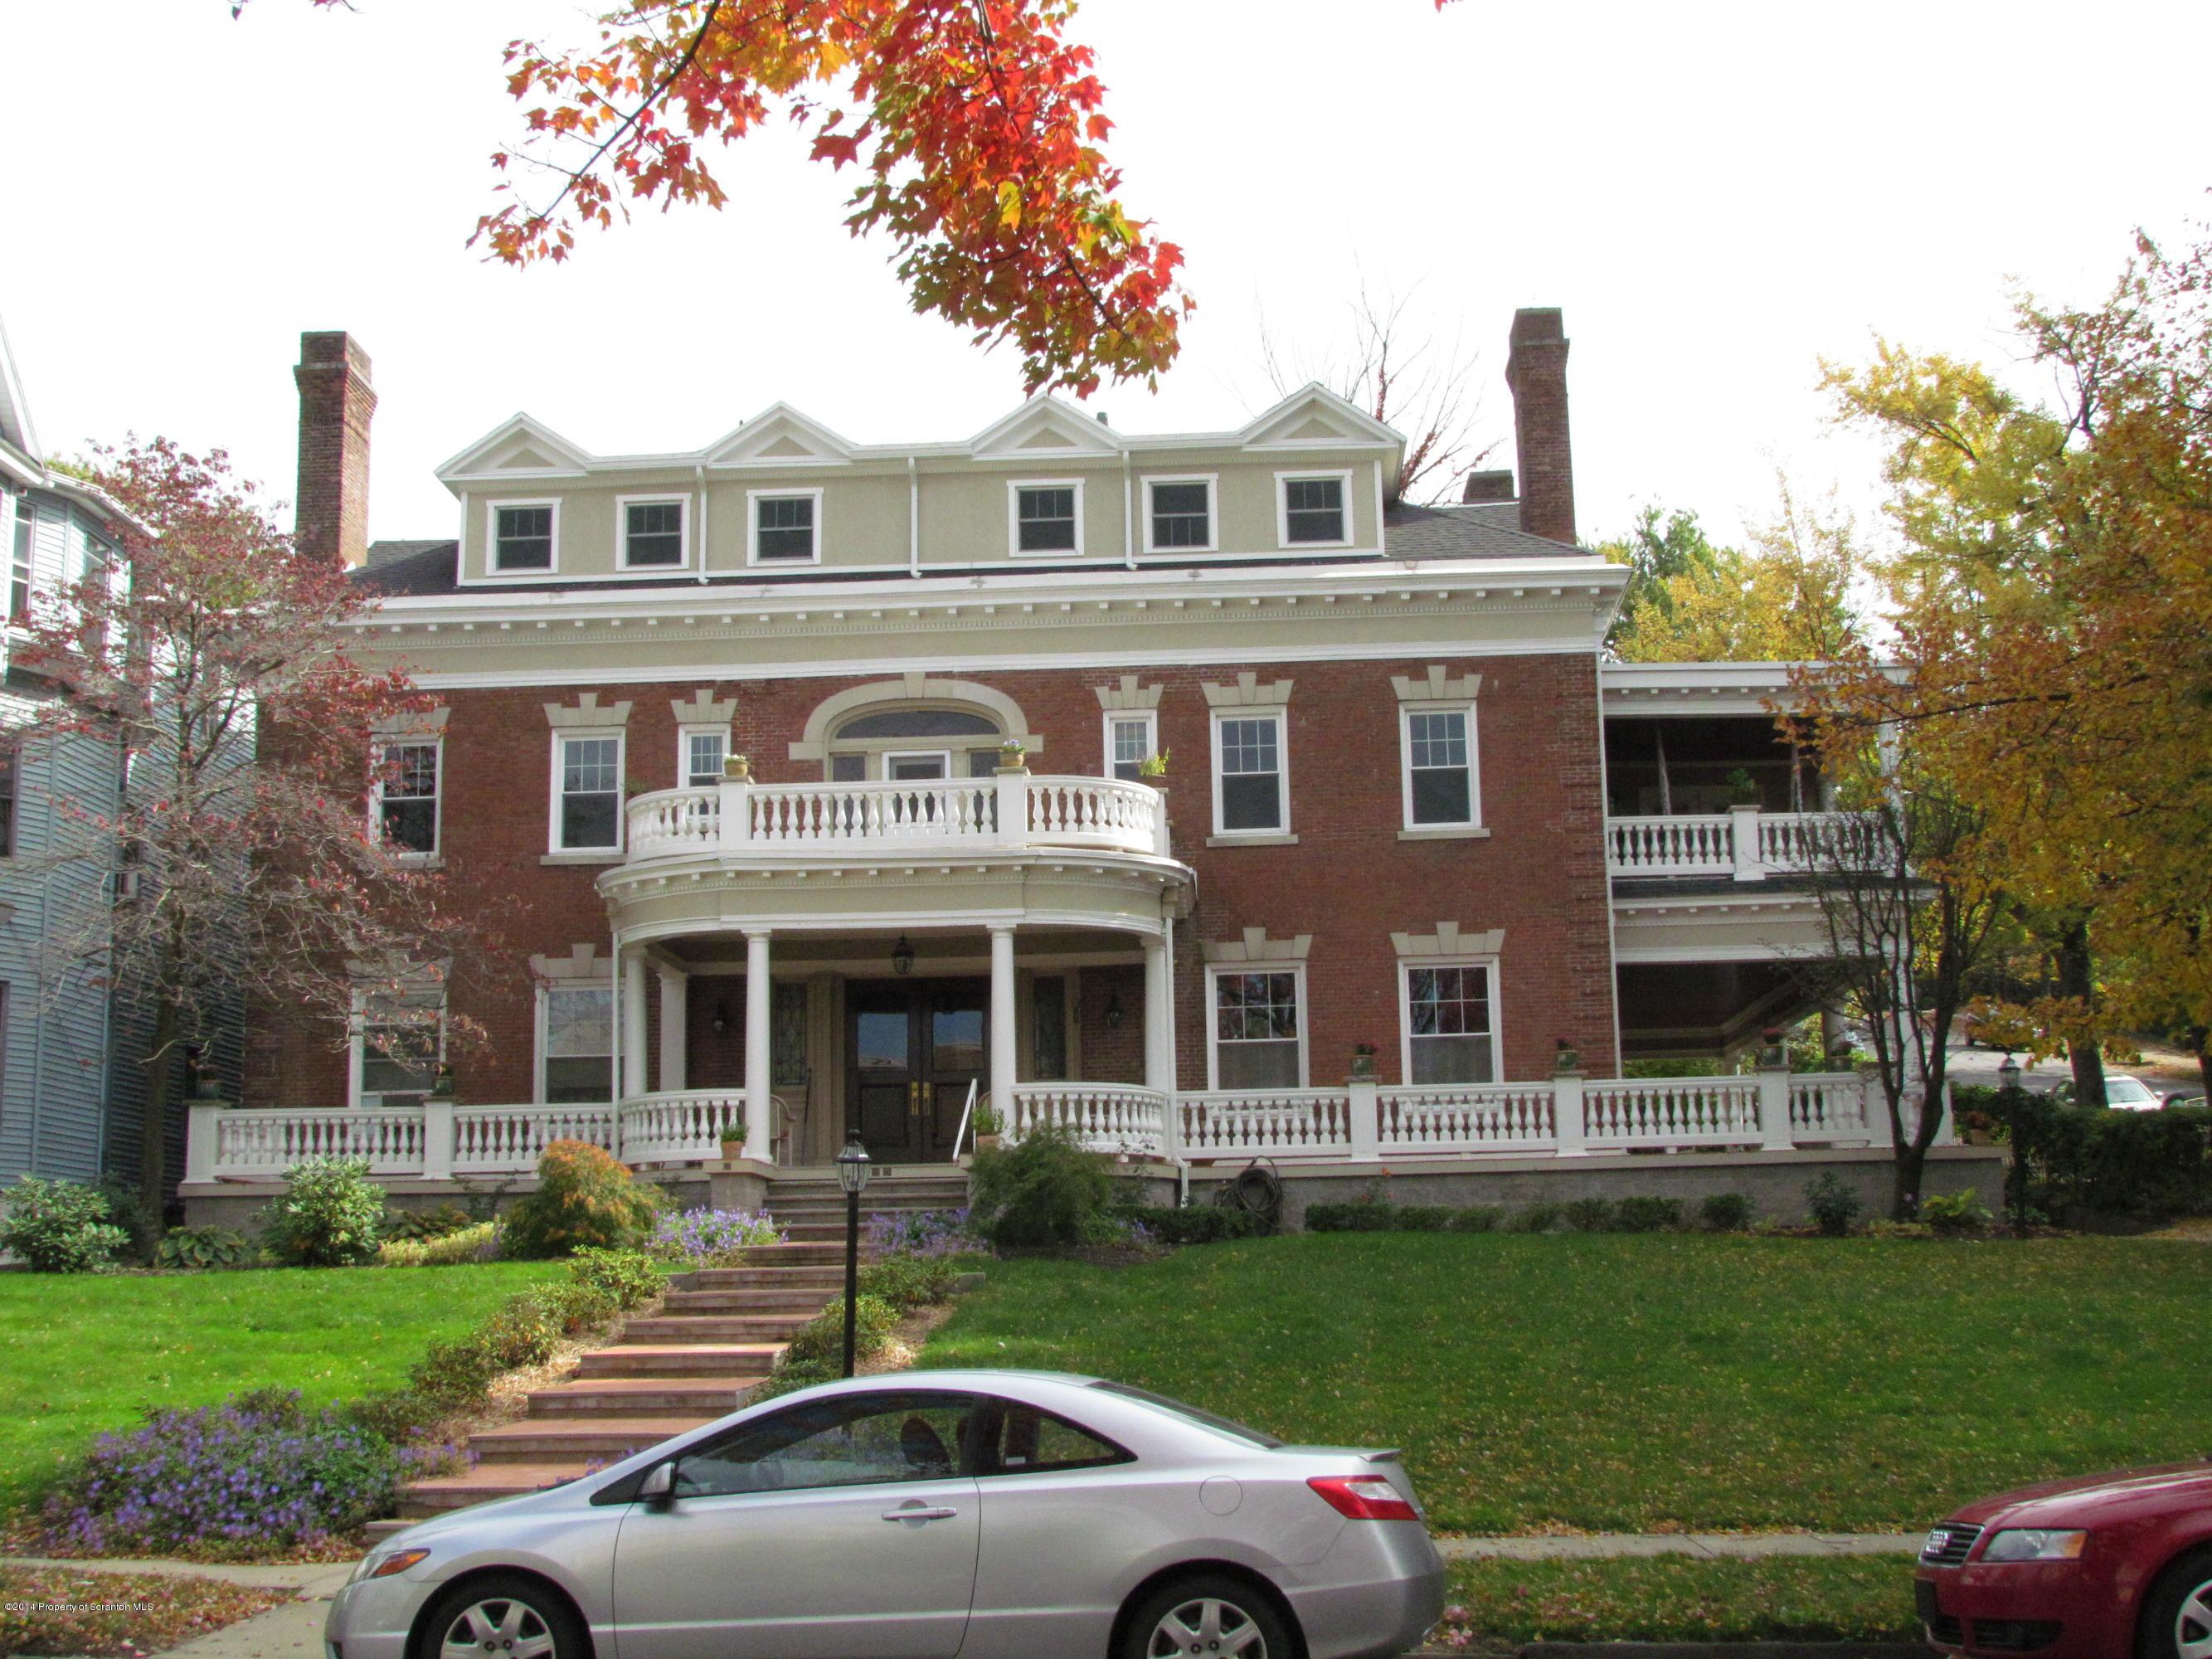 600 Clay Ave, Scranton, Pennsylvania 18510, 2 Bedrooms Bedrooms, 5 Rooms Rooms,1 BathroomBathrooms,Rental,For Lease,Clay,19-3384